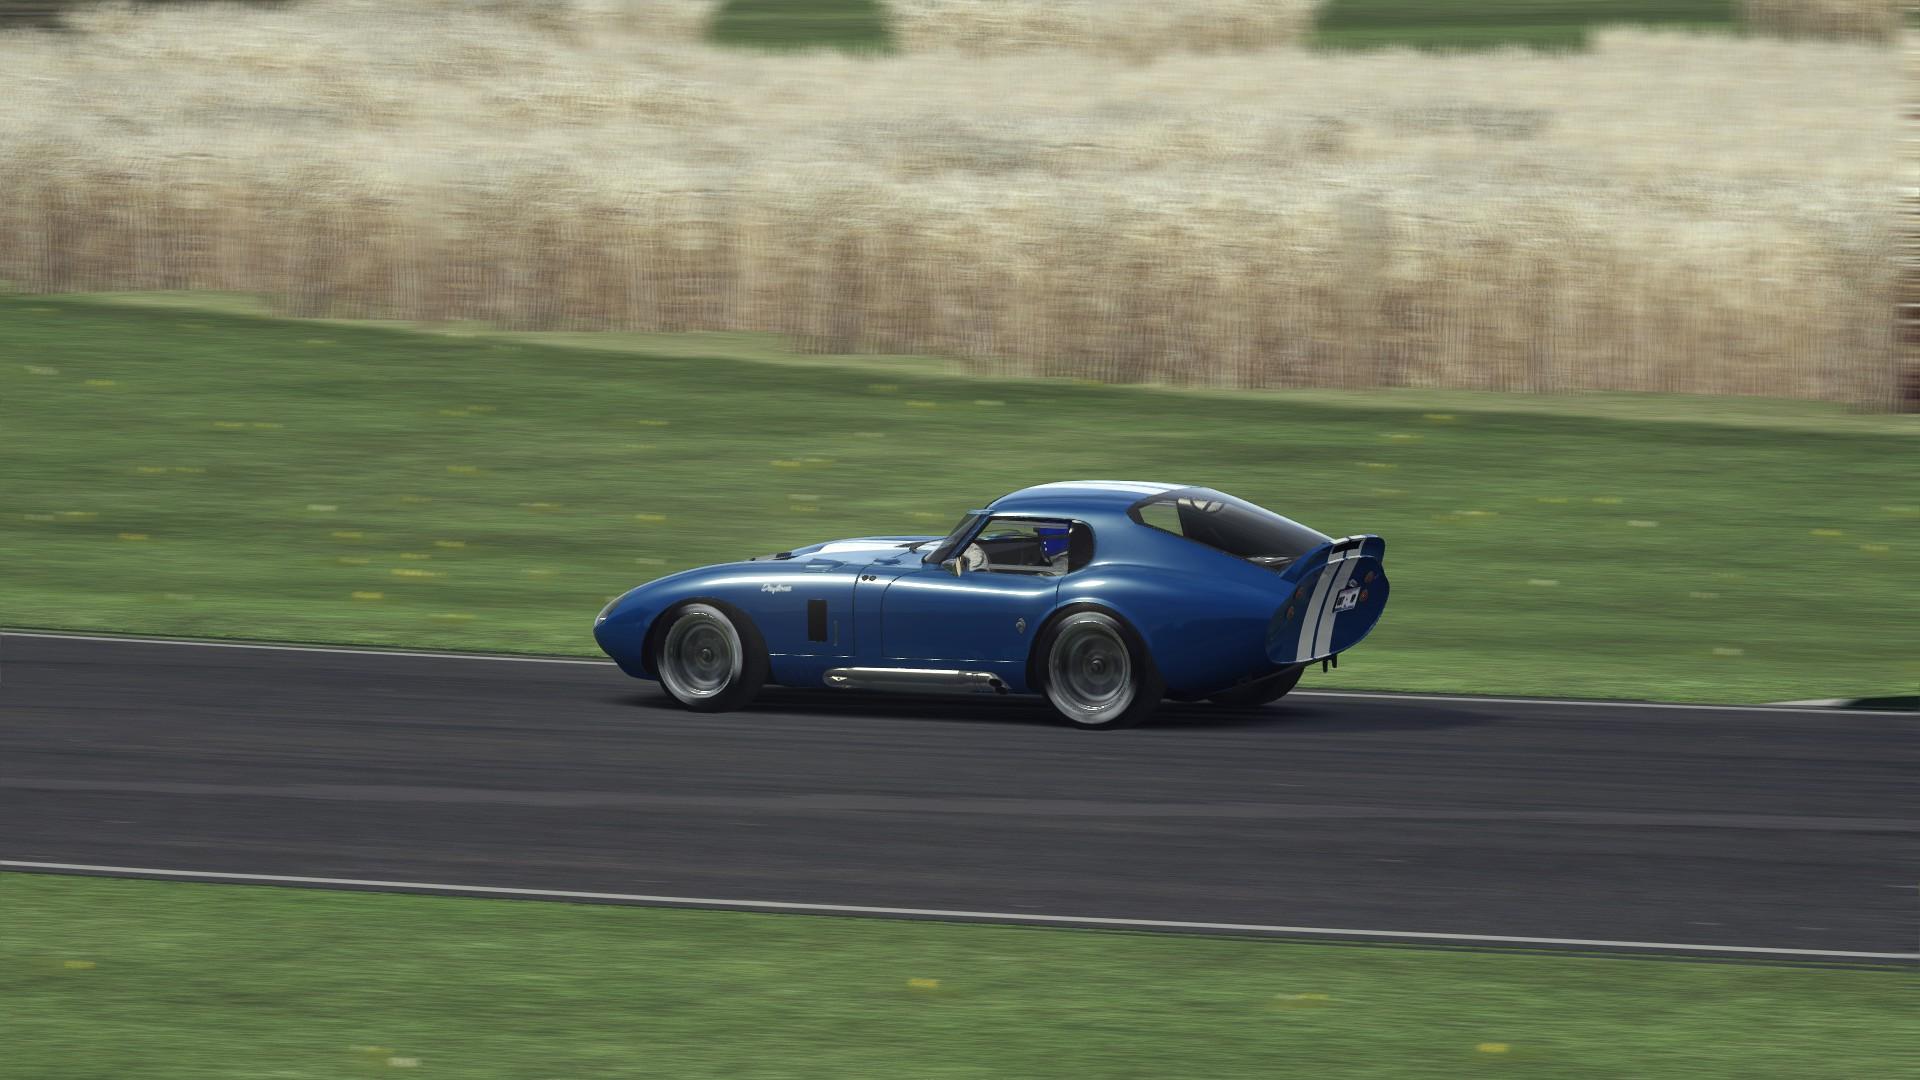 Shelby Daytona Coupe AC1.16.x 077_032018.jpg